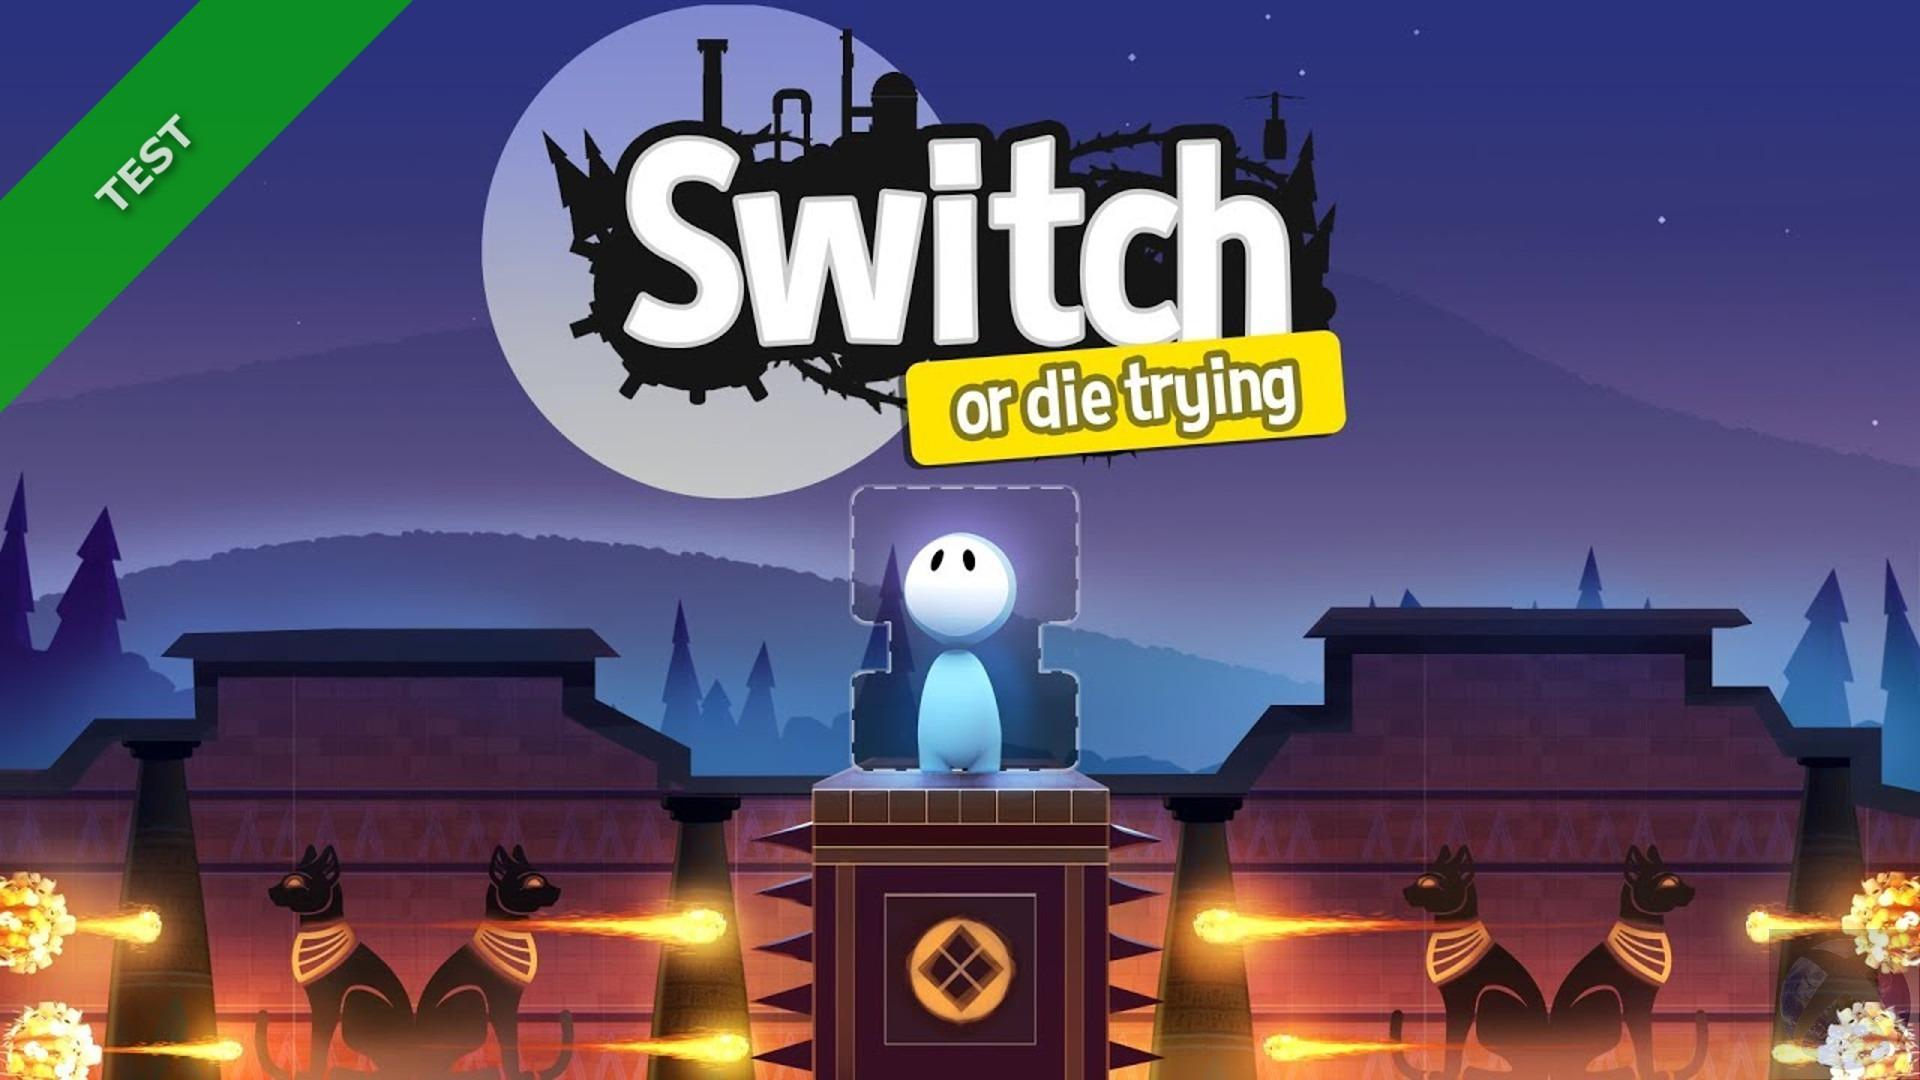 TEST Switch-or Die Trying - XWFR